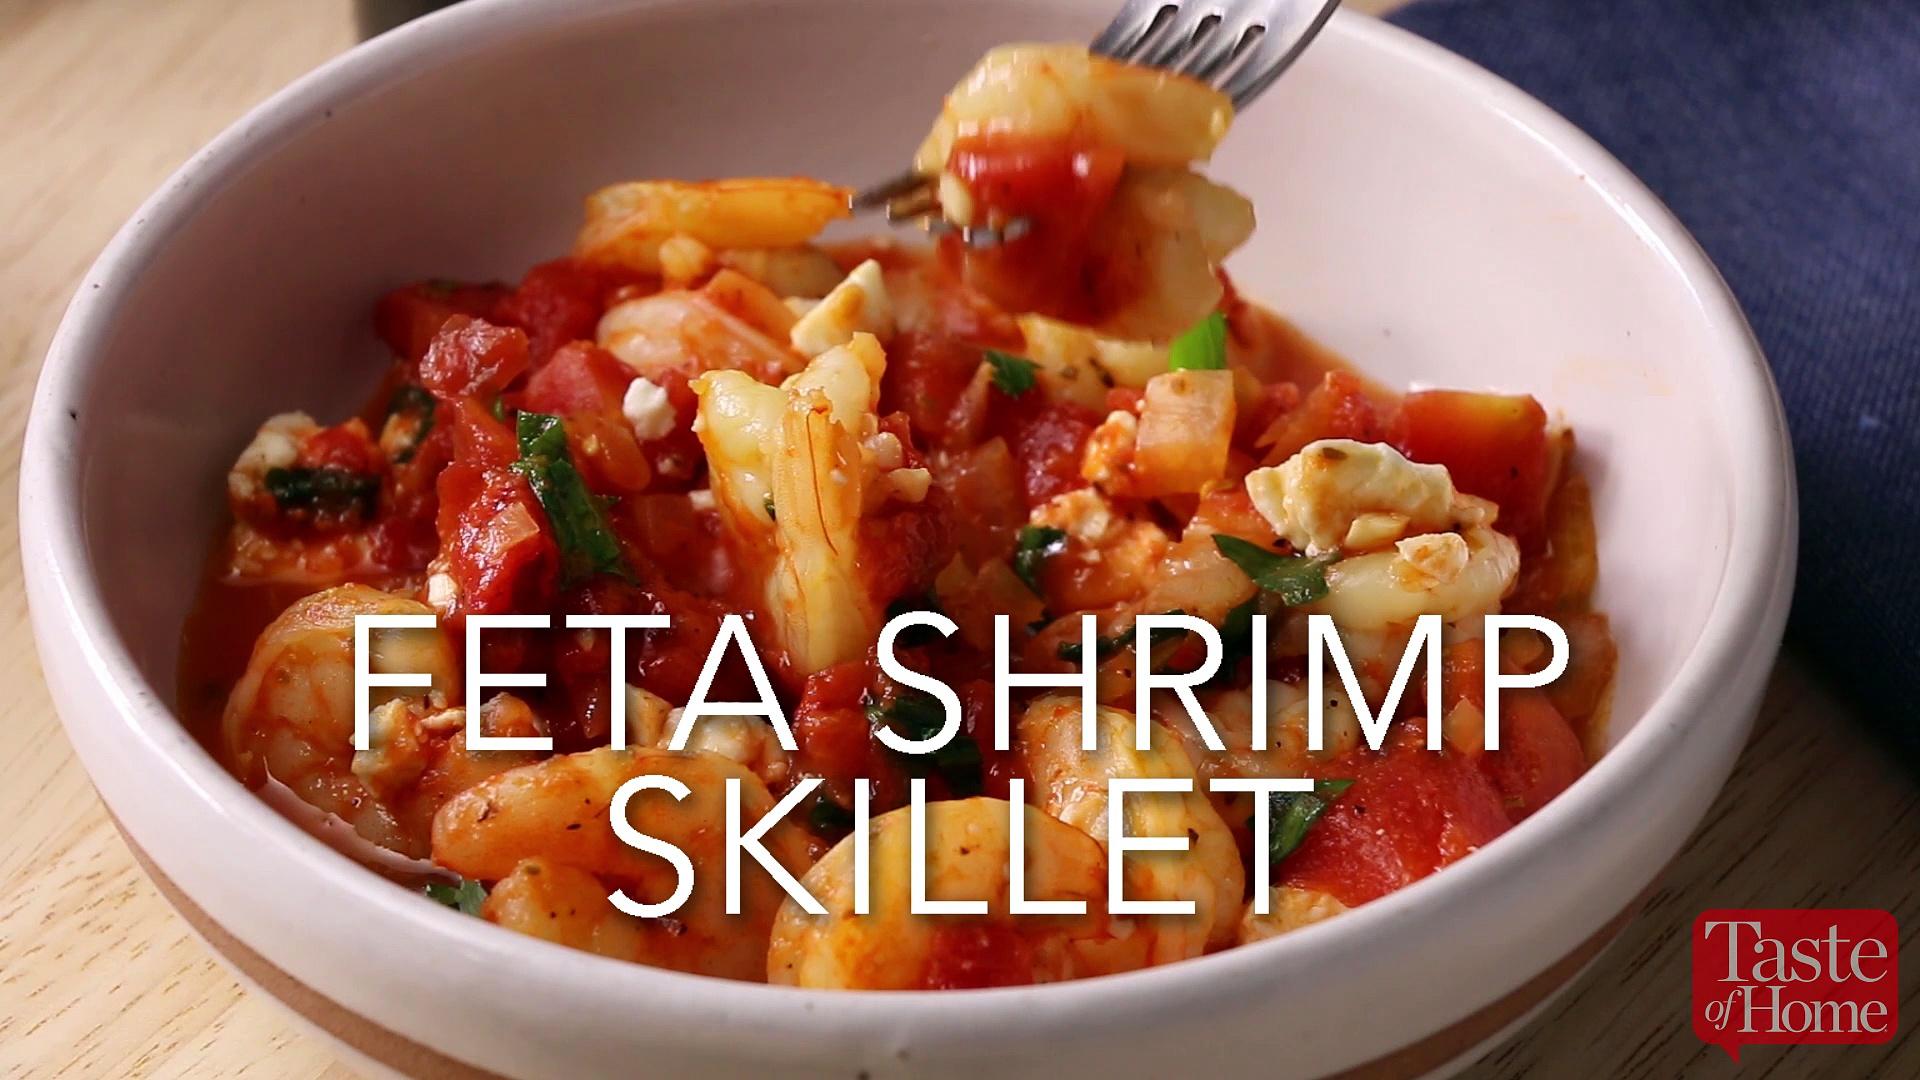 Feta Shrimp Skillet